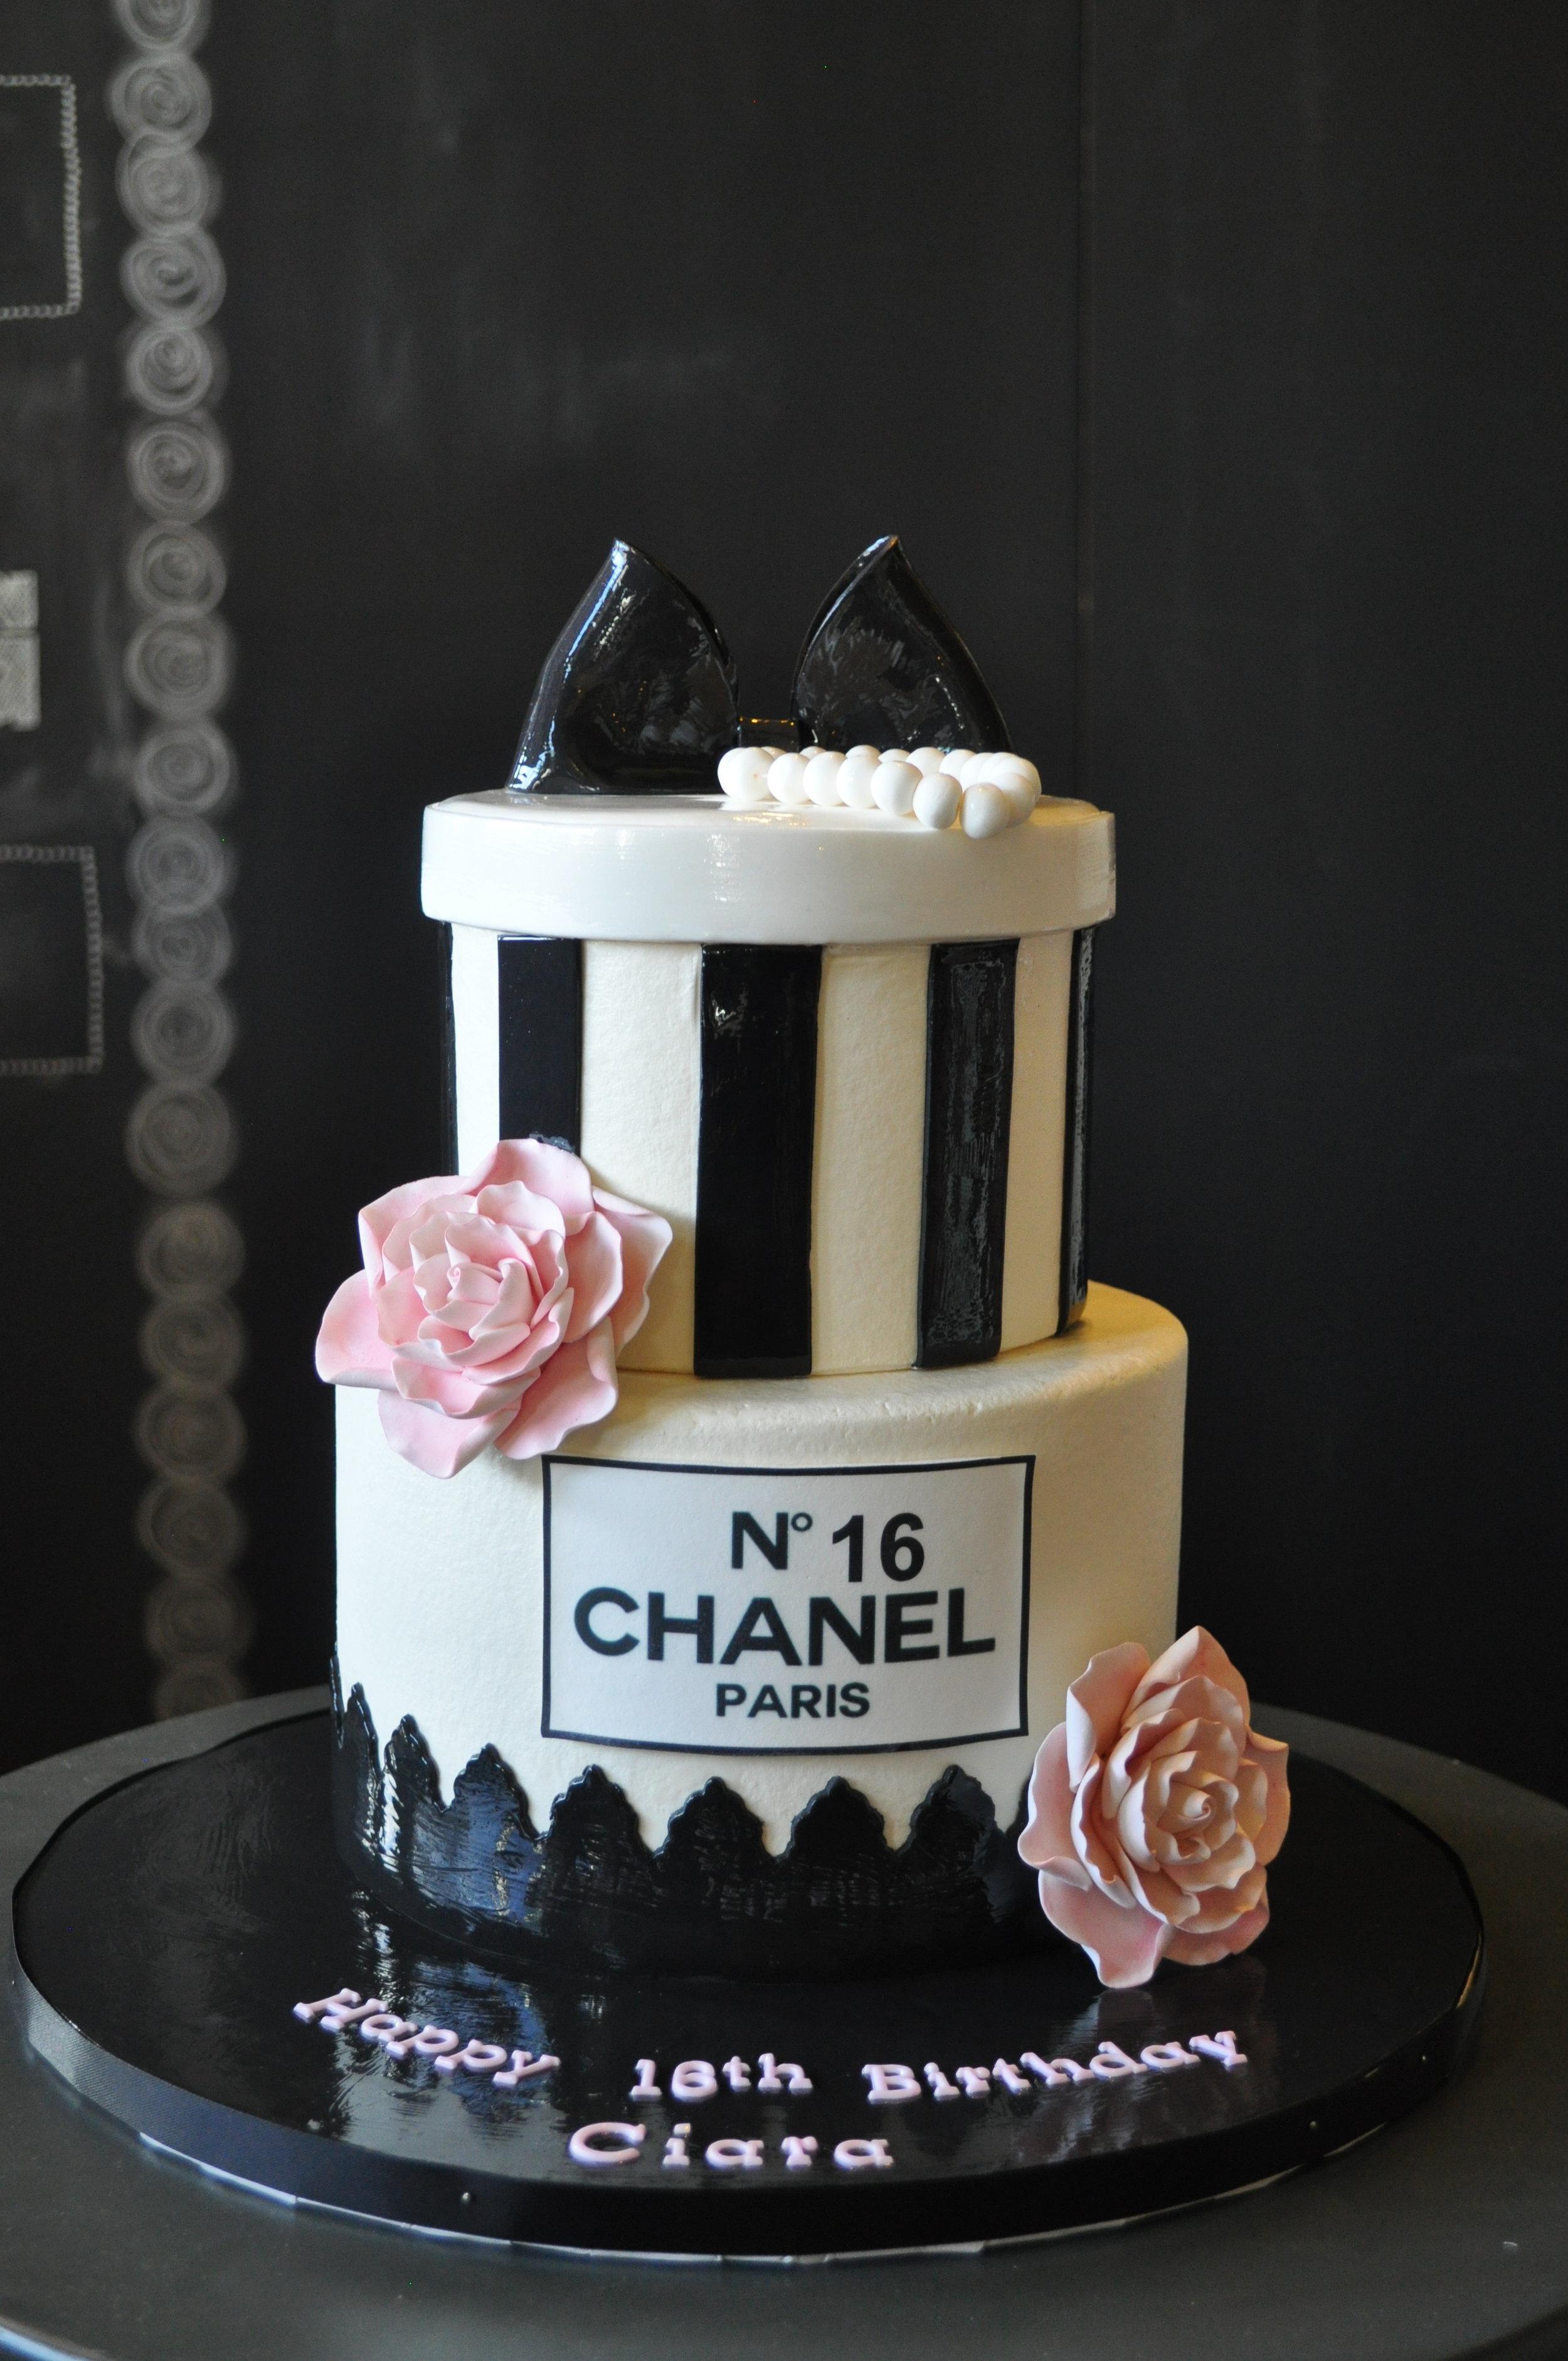 Chanel Cake.jpg